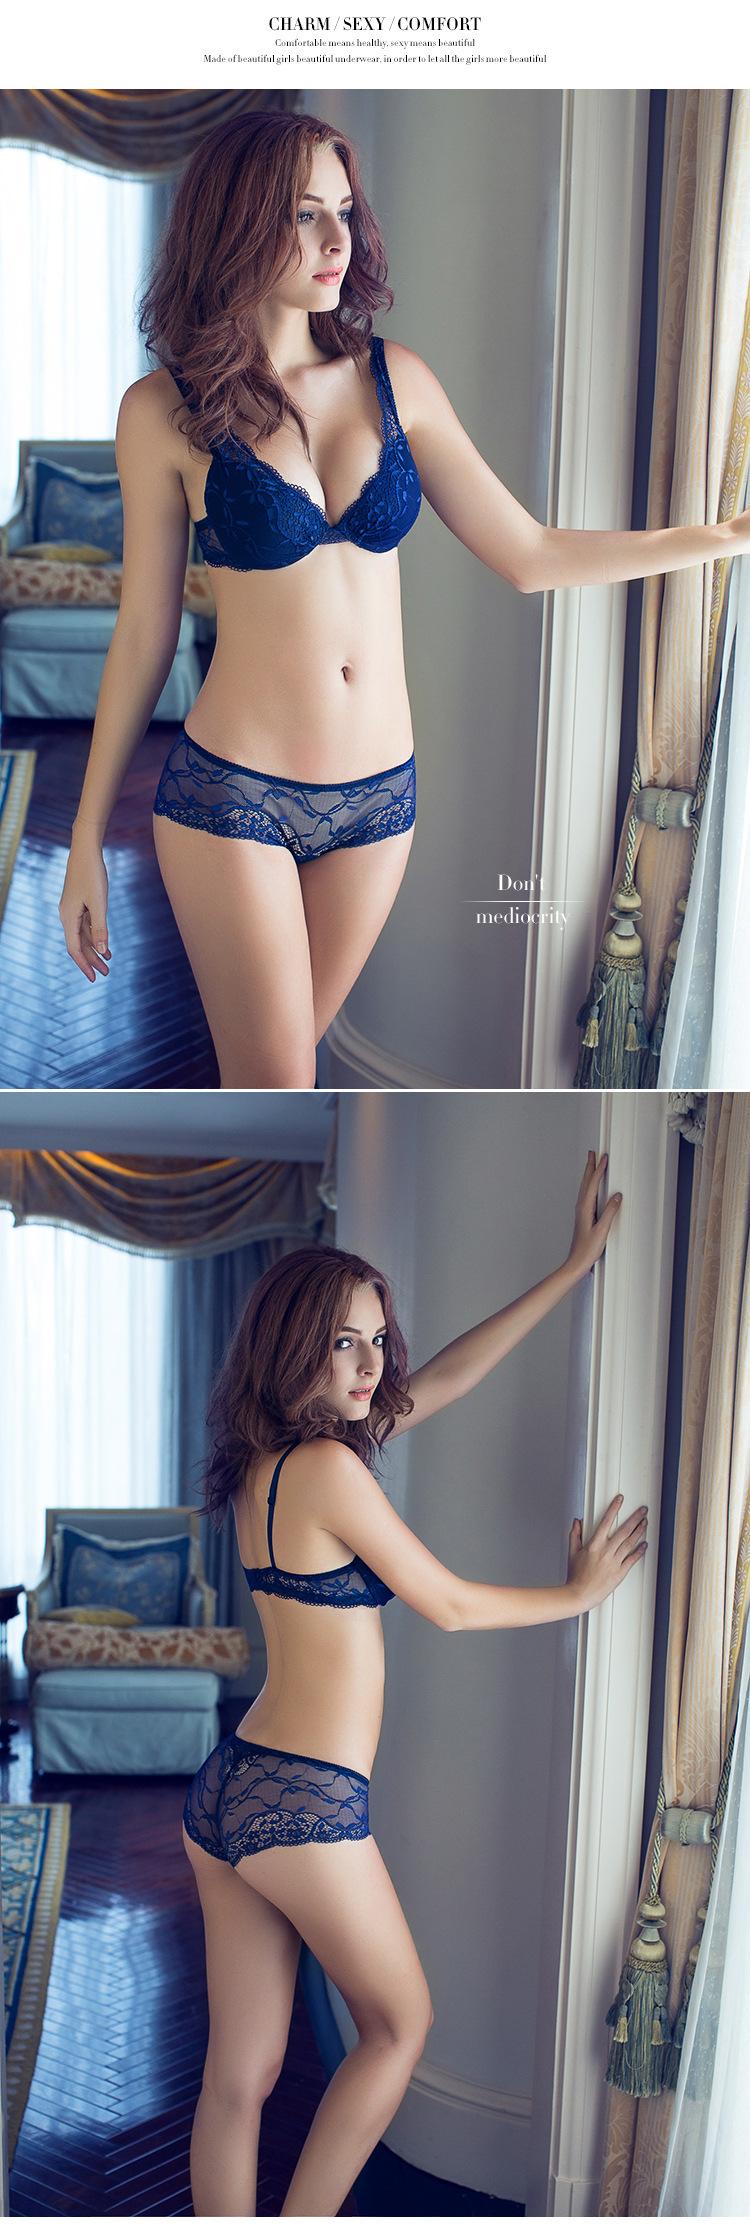 17 Women underwear bra suit Push Up Bra Set Sexy Deep v gather adjustment female lingerie Lace Bra and pants sets 75 B C Cup 3